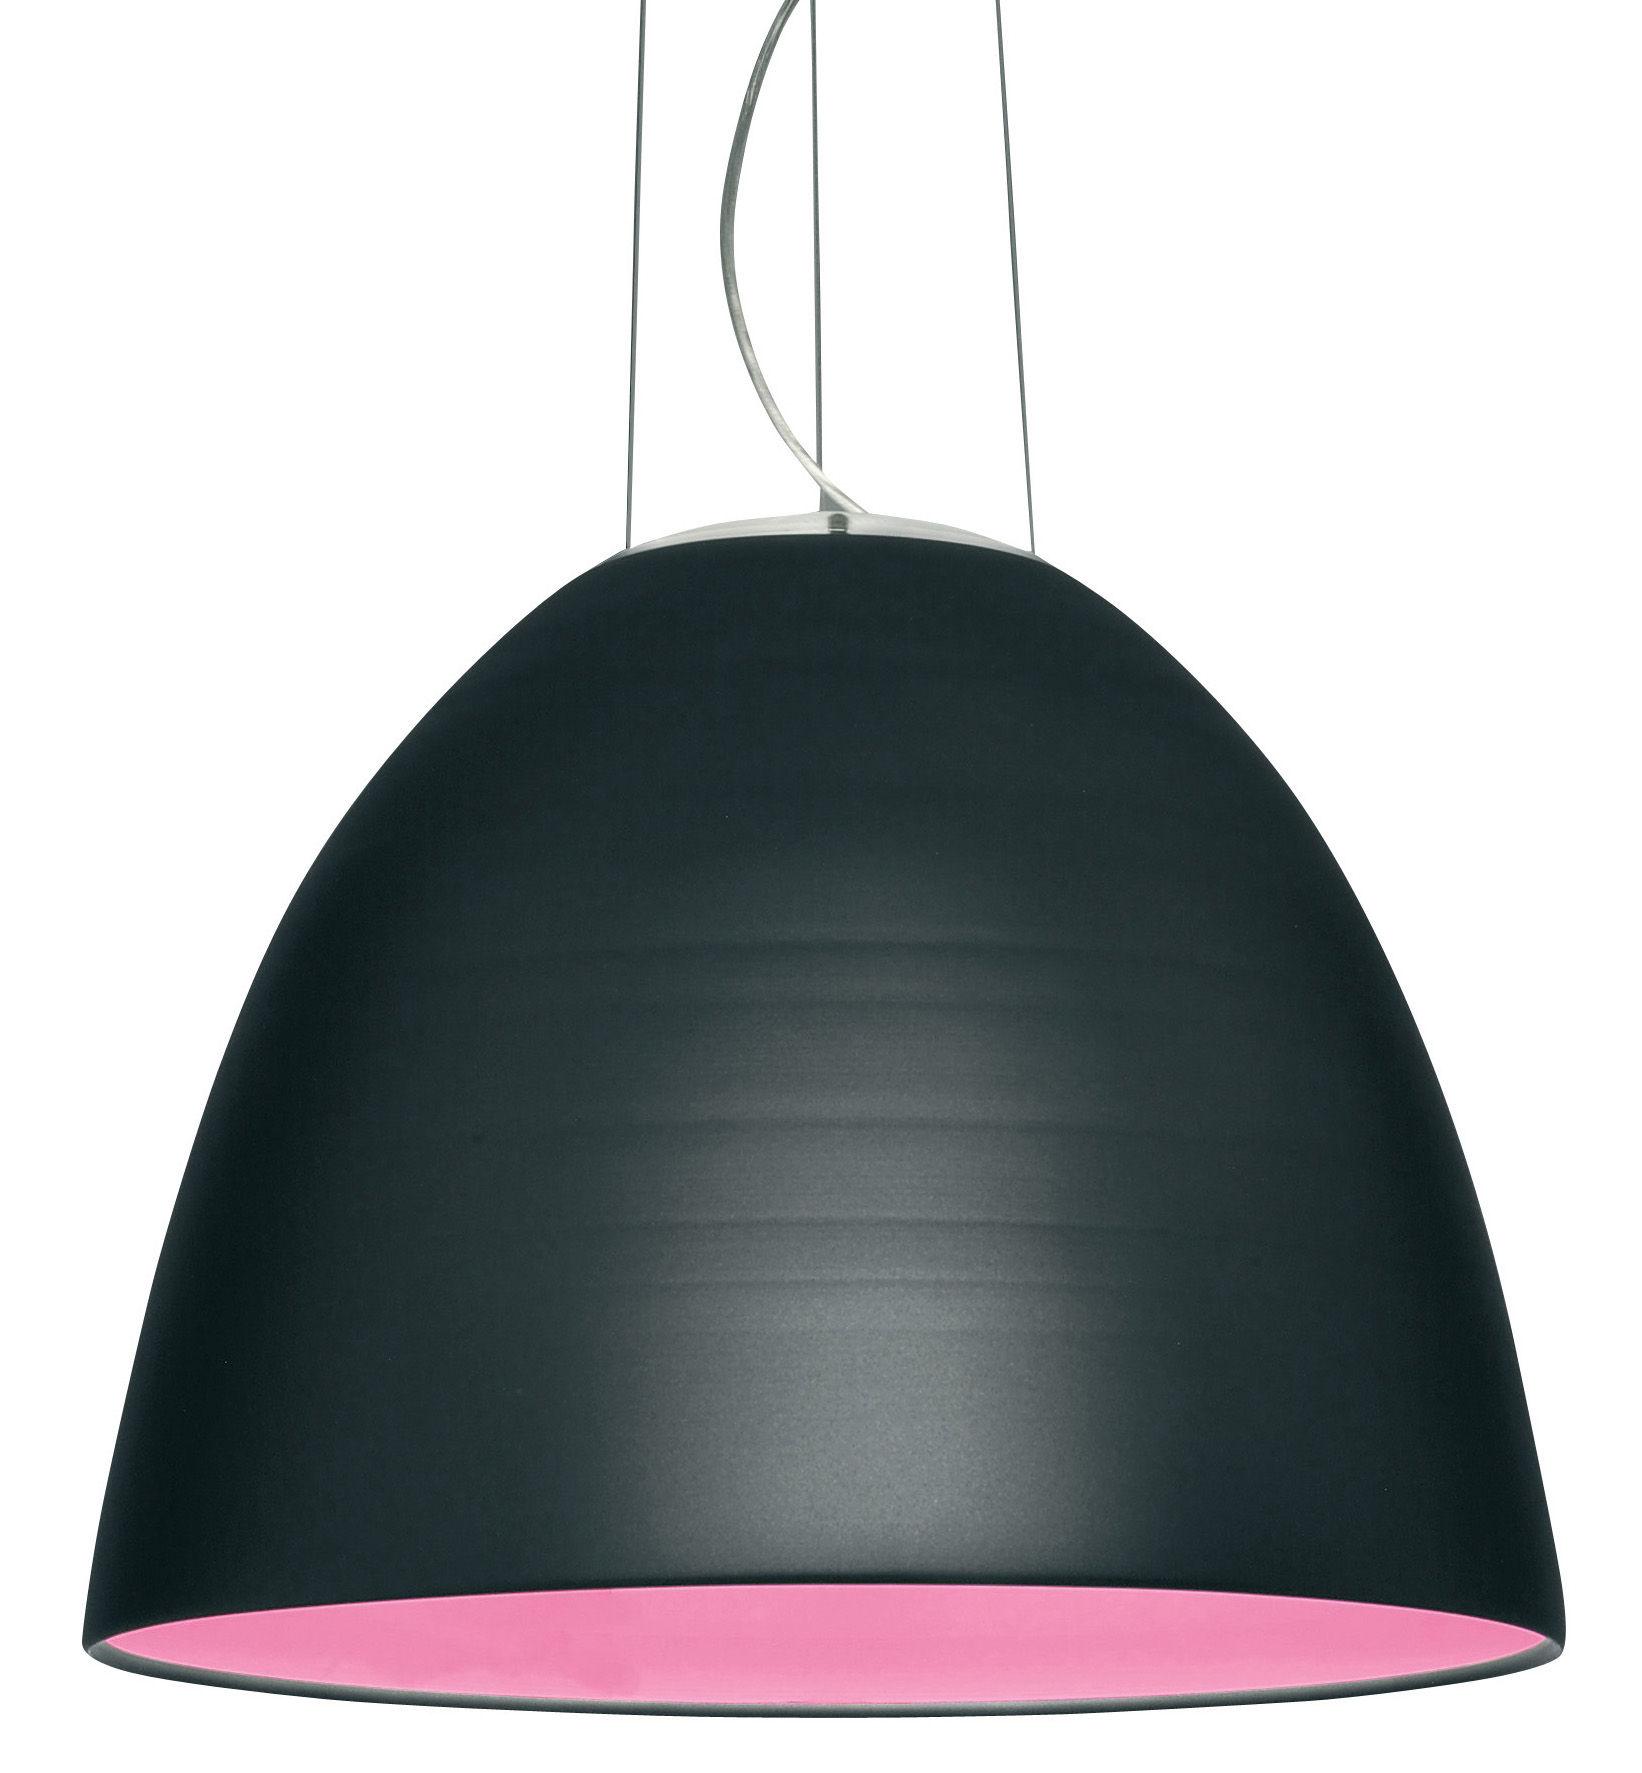 Illuminazione - Lampadari - Sospensione Nur di Artemide - Grigio antracite - alogena - Alluminio